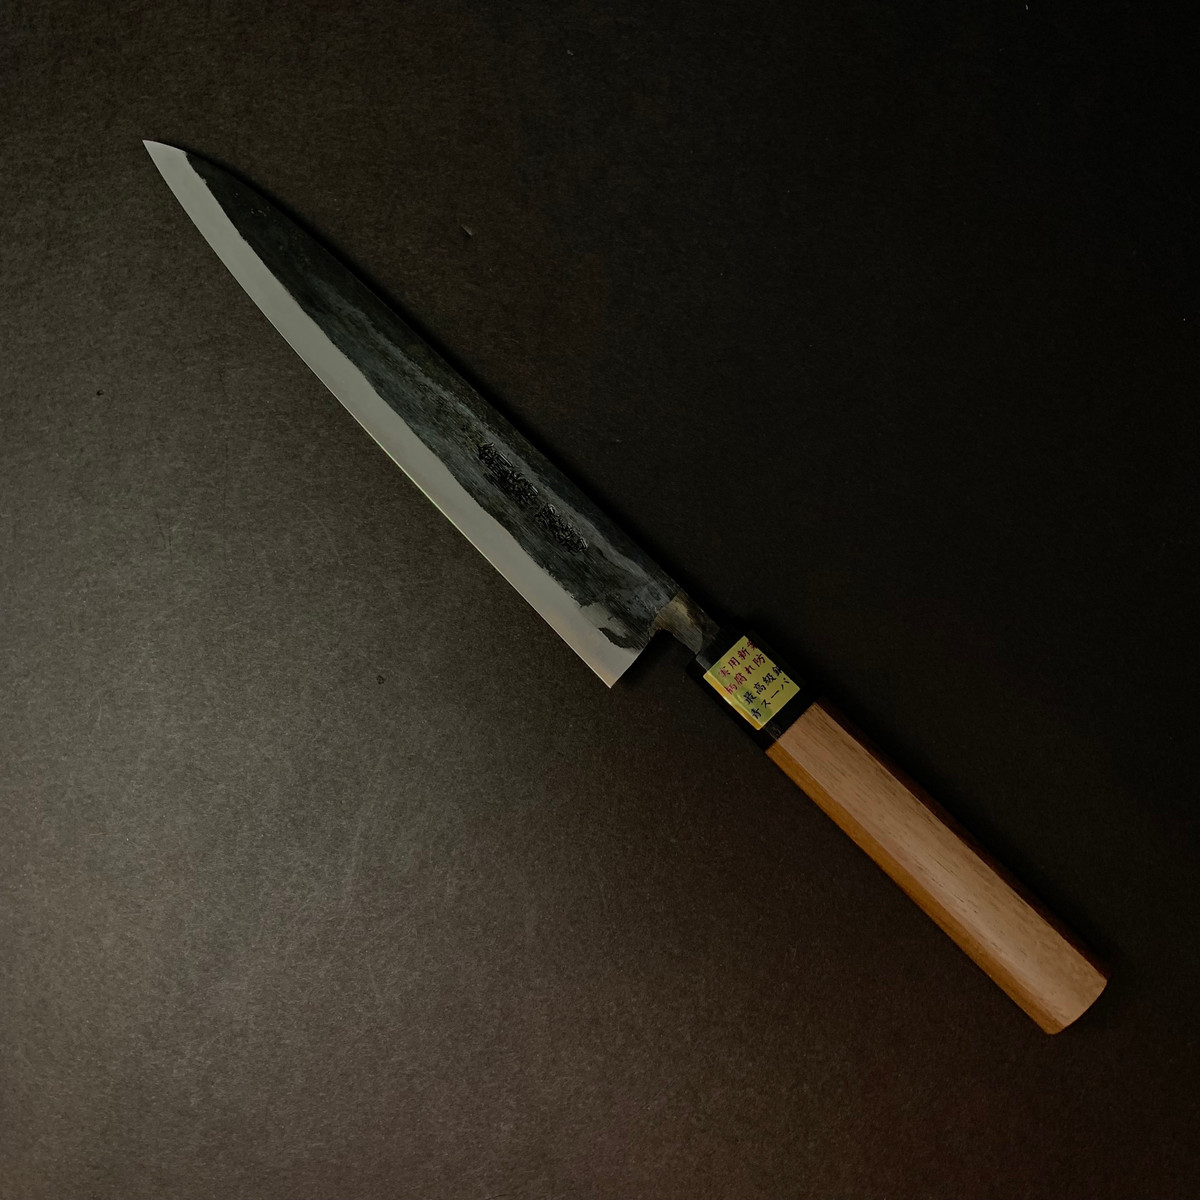 Moritaka AS - Yanigiba 210mm